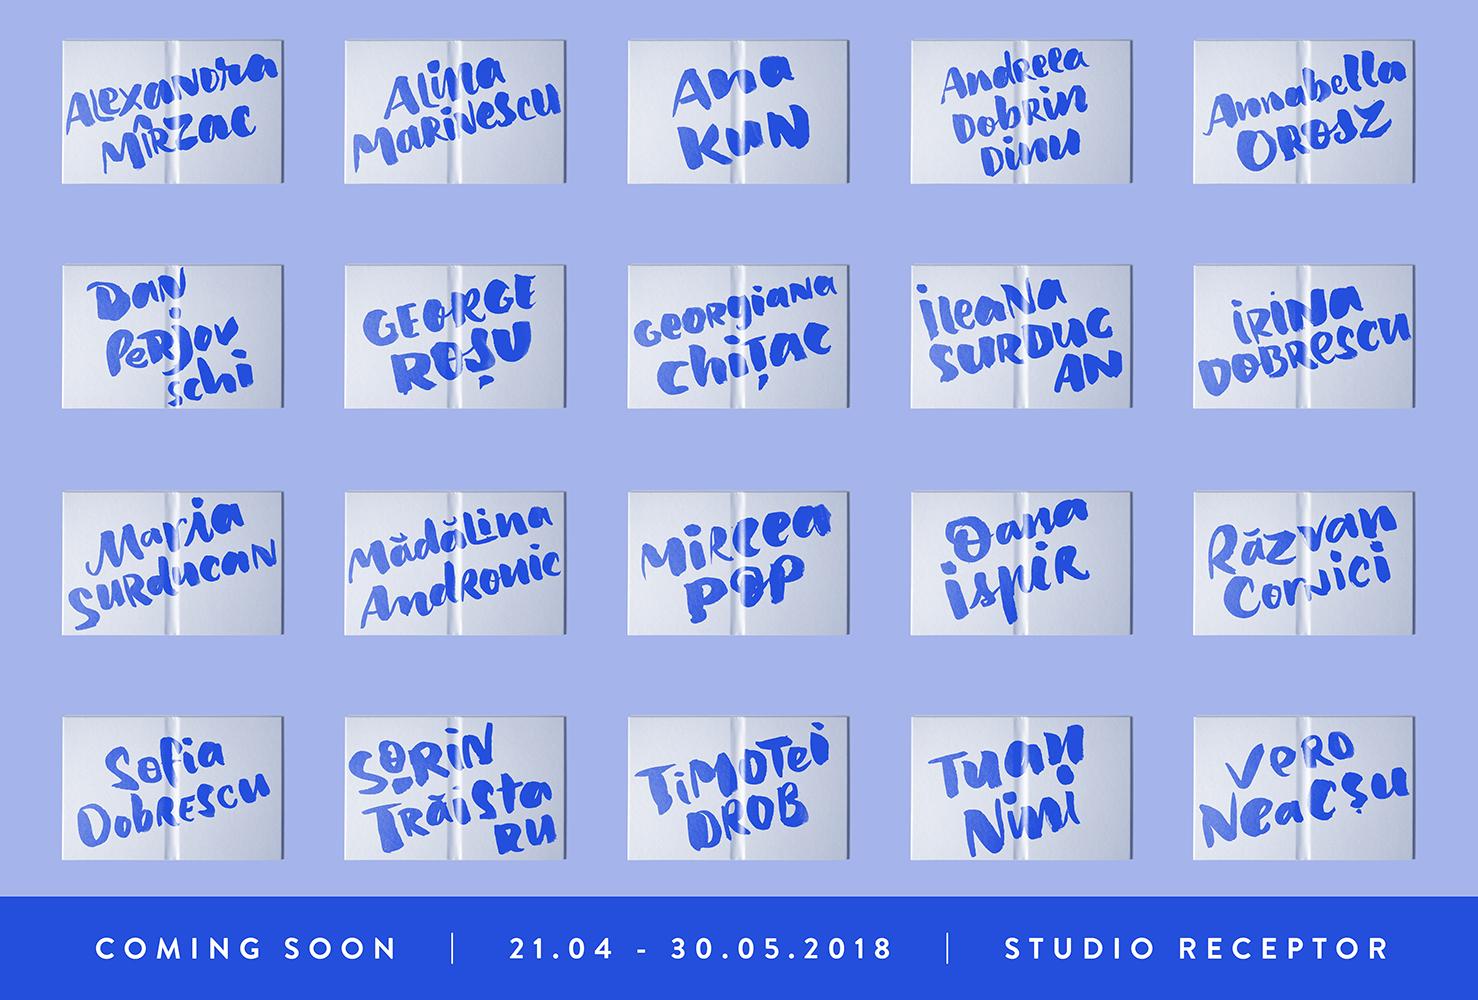 Coming soon (21.04 – 30.05.2018)